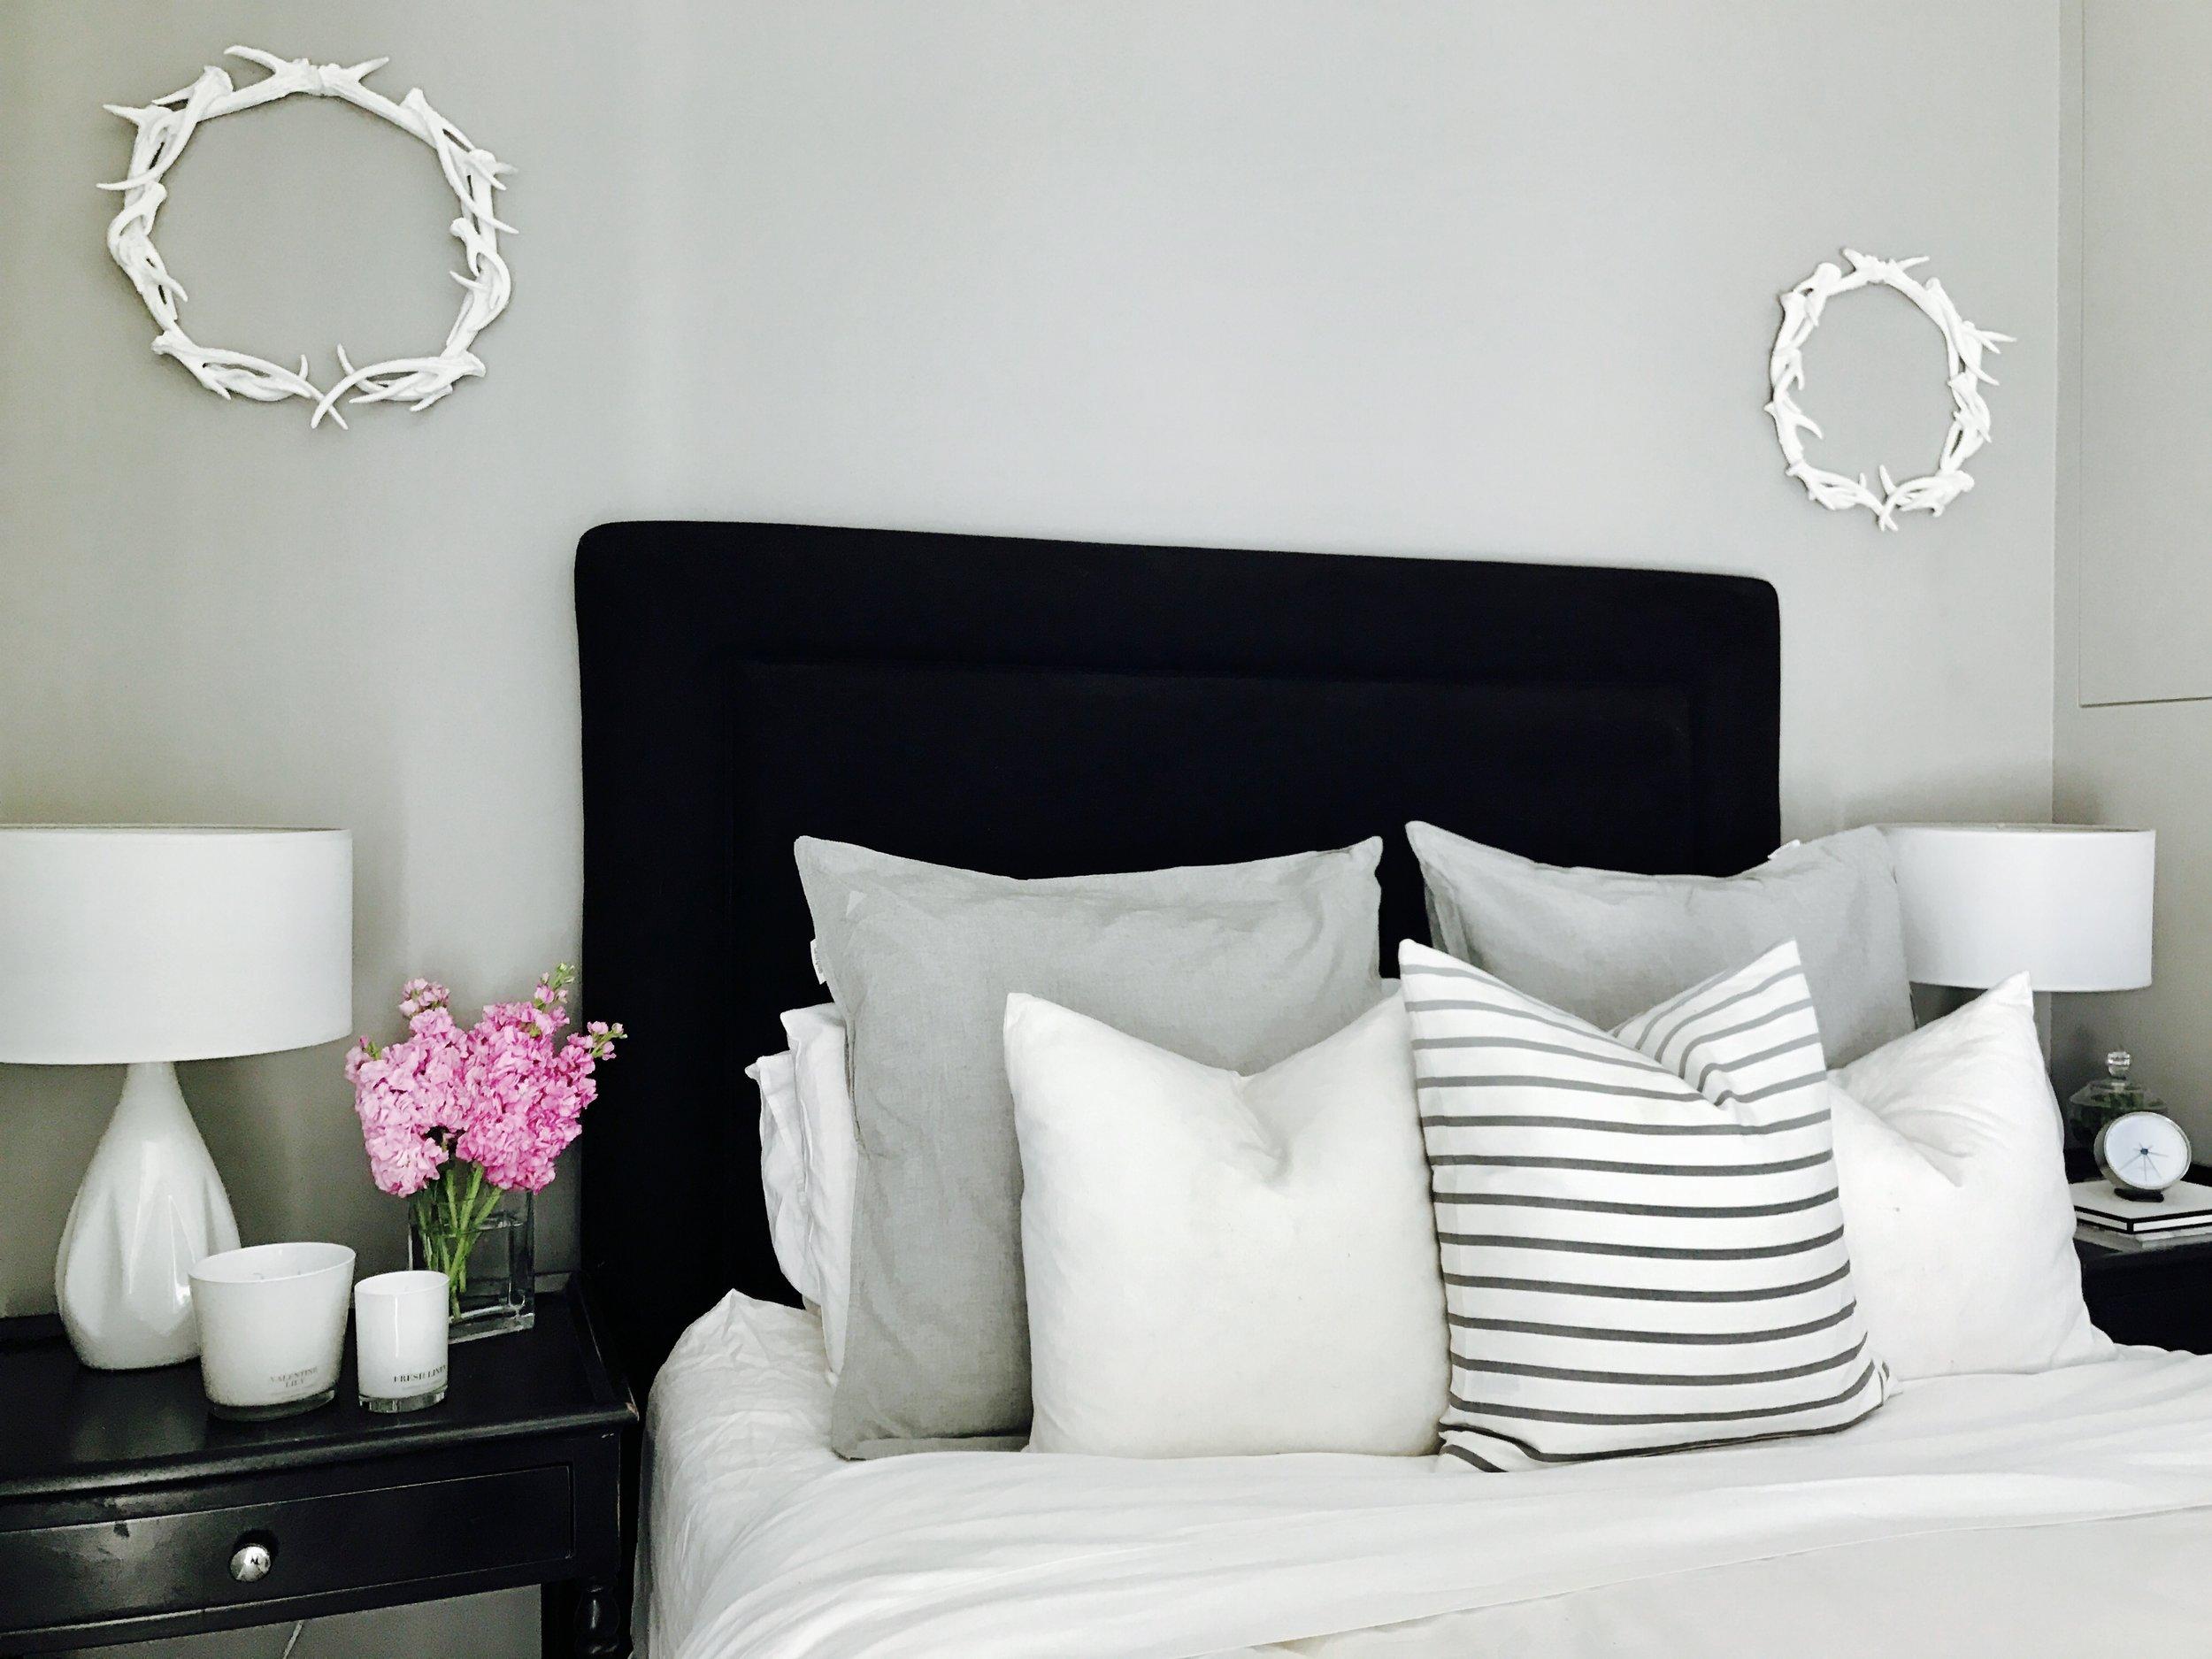 interior-decorating-bedroom-Liz-Hayward-Styling-for-Sale.jpg